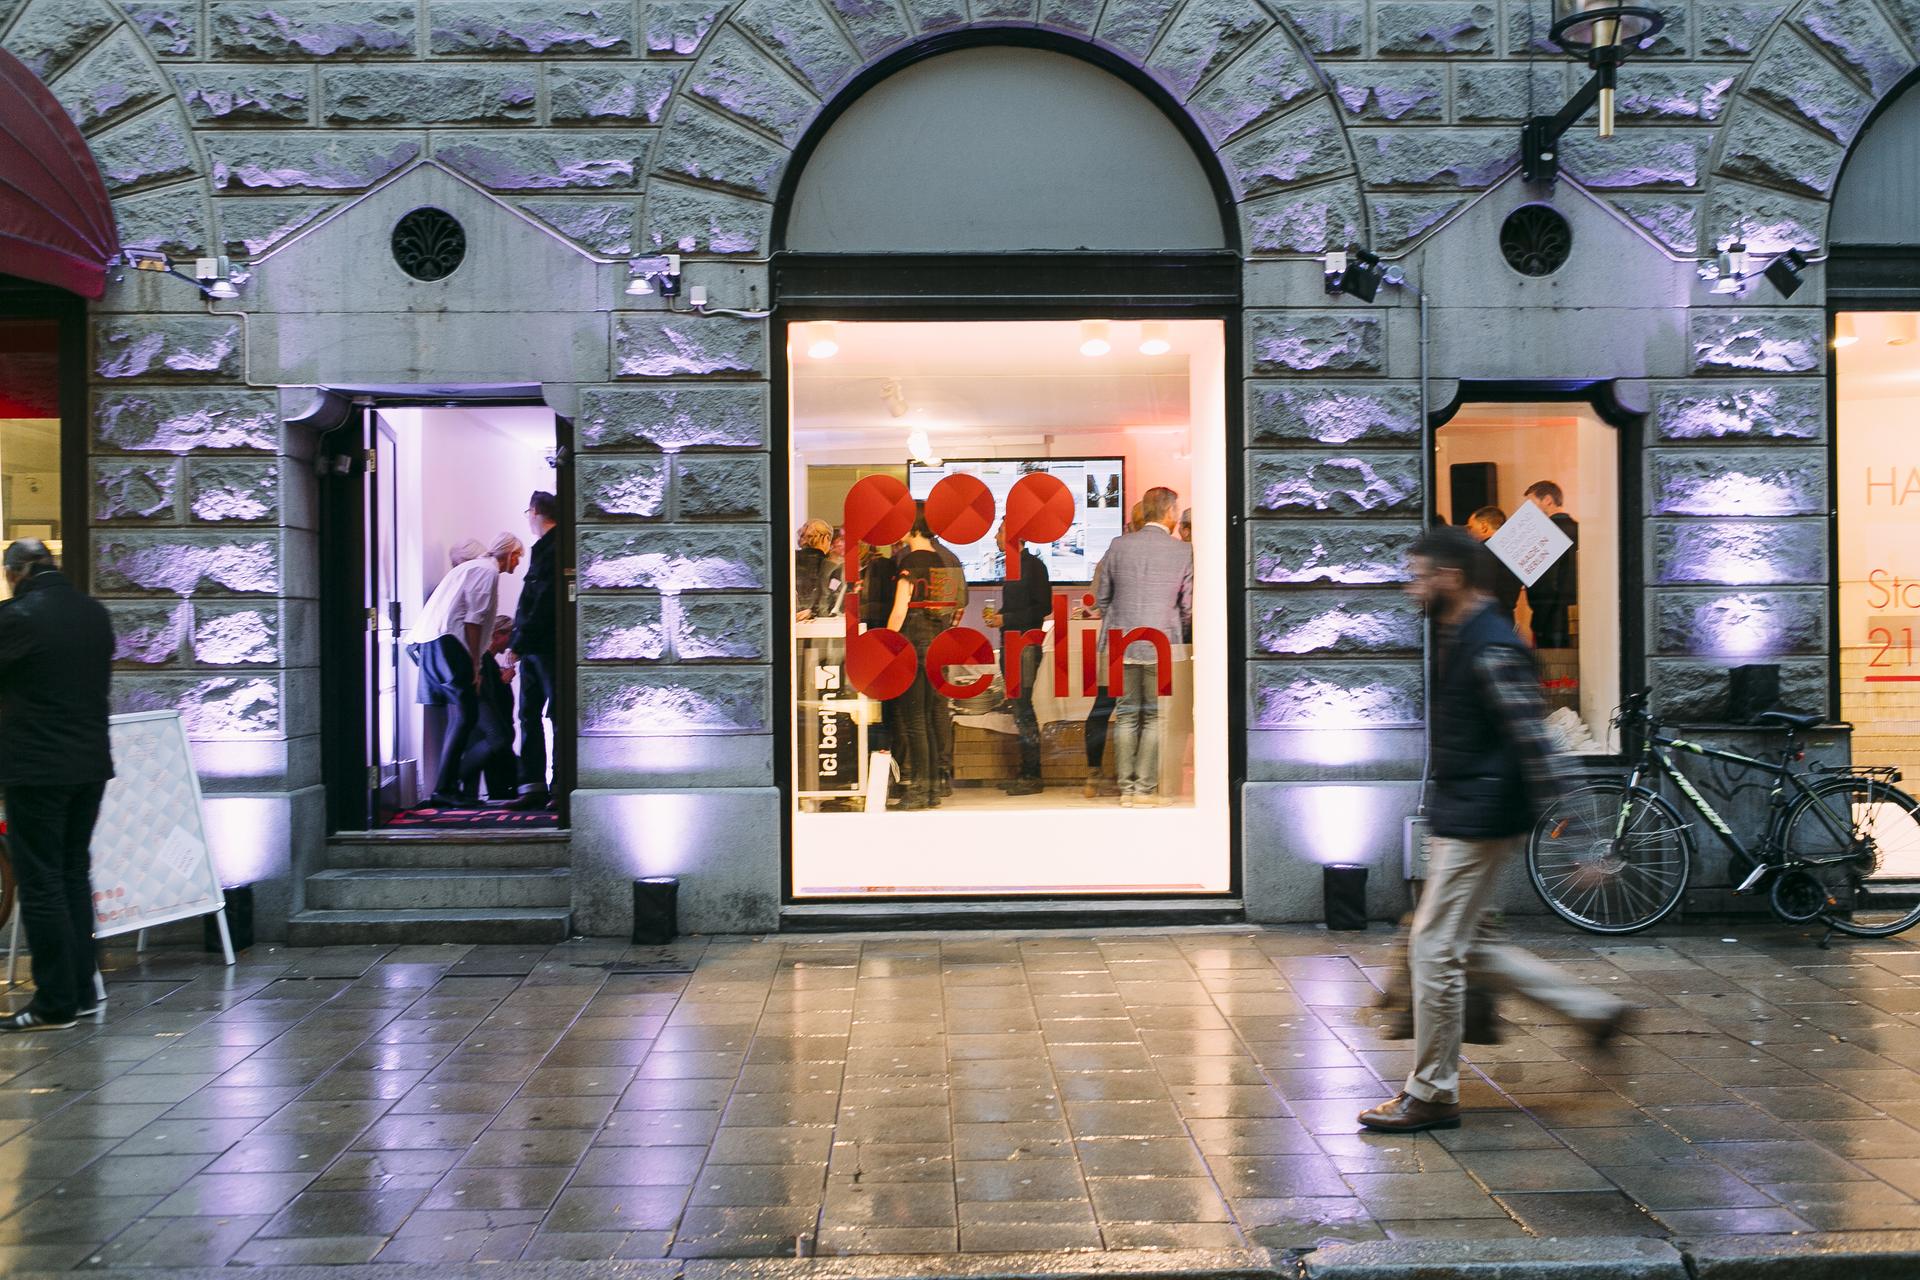 pop into berlin berliner szene k che tourt ab 19 september durch deutsche st dte alles. Black Bedroom Furniture Sets. Home Design Ideas